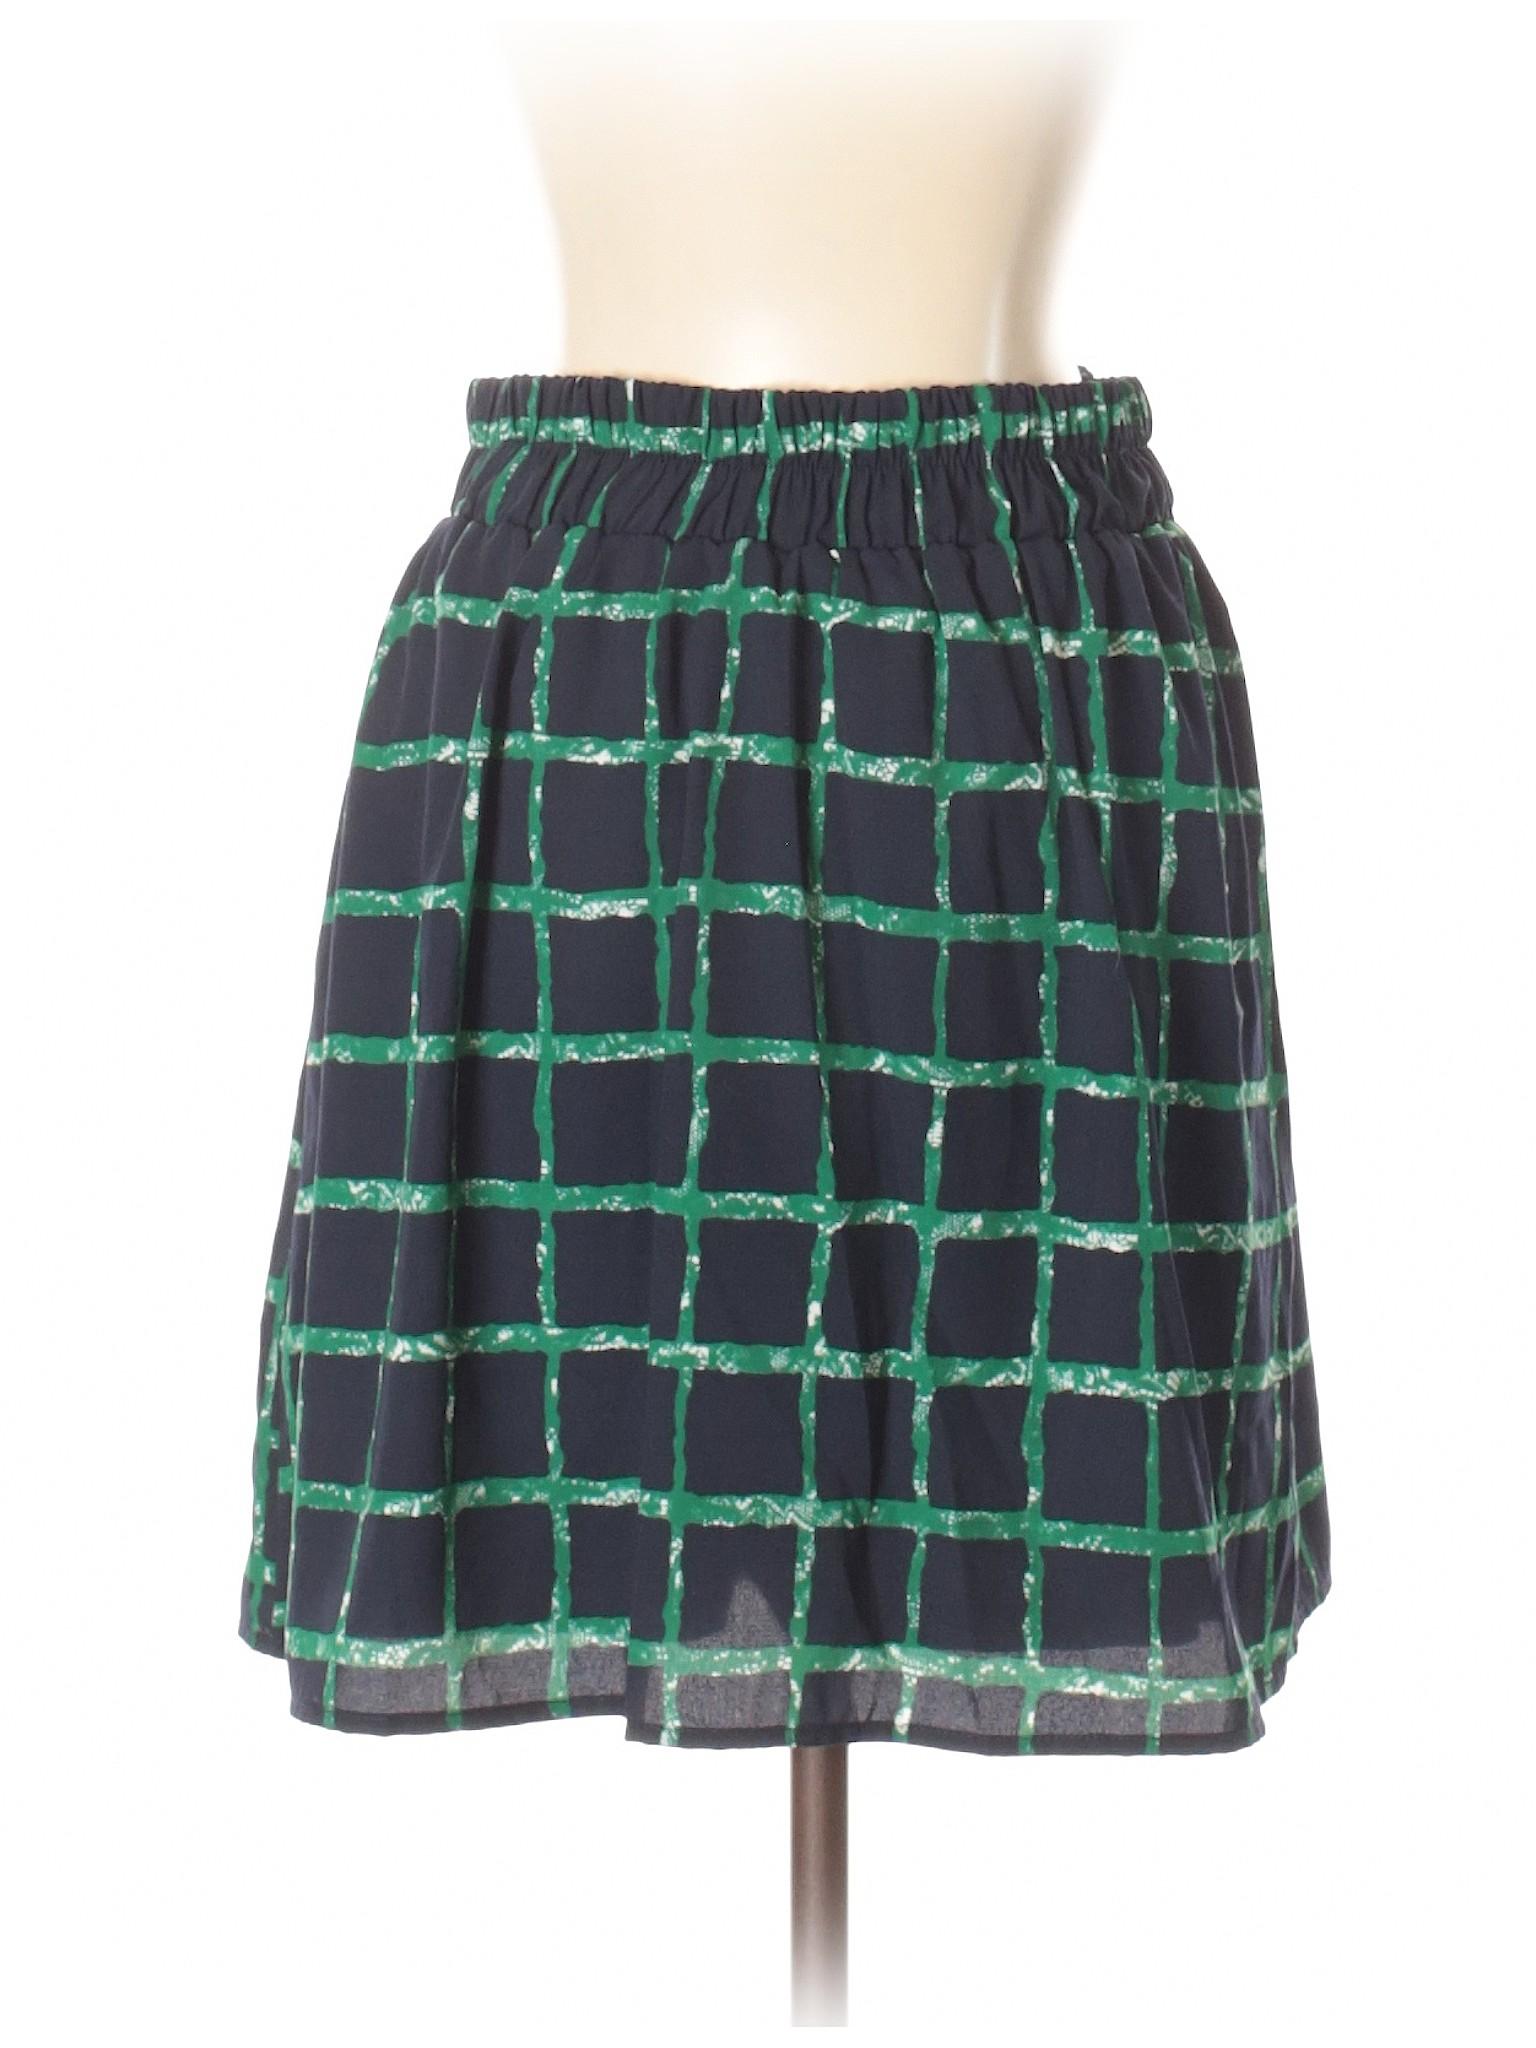 Boutique Boutique Casual Skirt Casual Skirt Casual Boutique Skirt vIXqwI